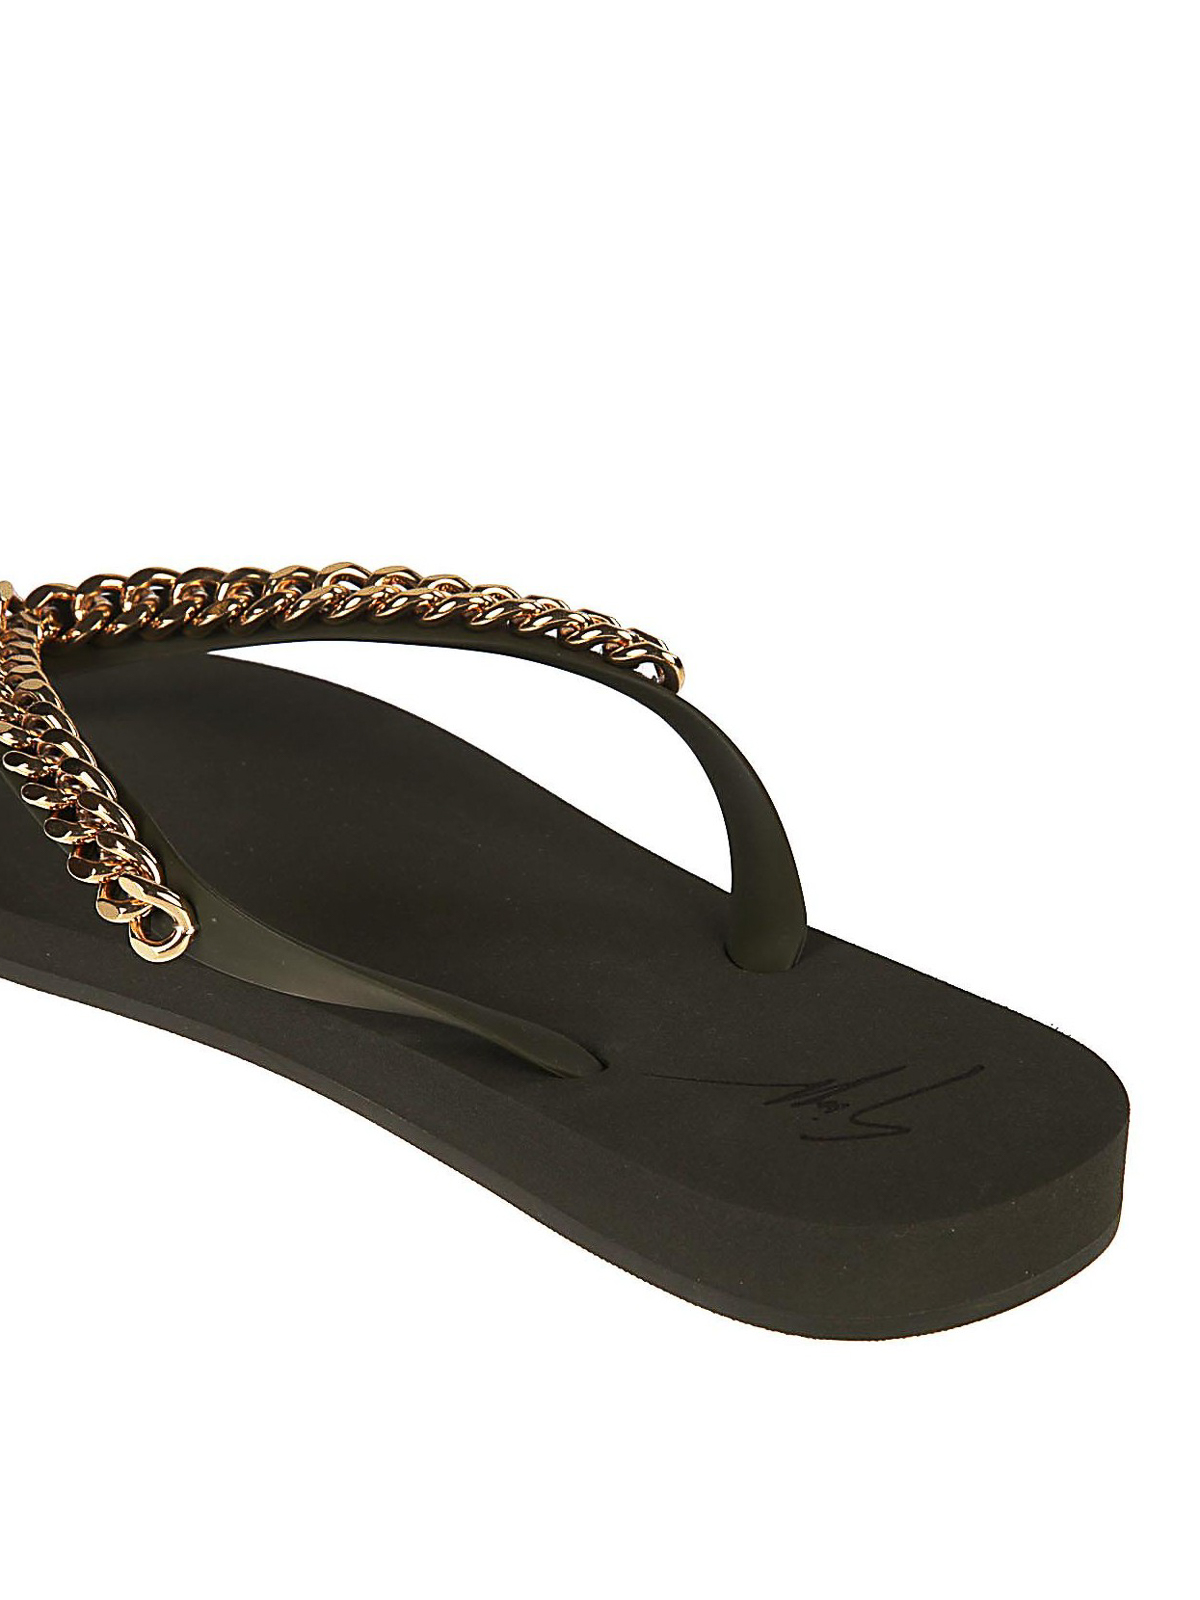 3591e87905a2 iKRIX GIUSEPPE ZANOTTI  flip flops - Chain detailed rubber flip flops